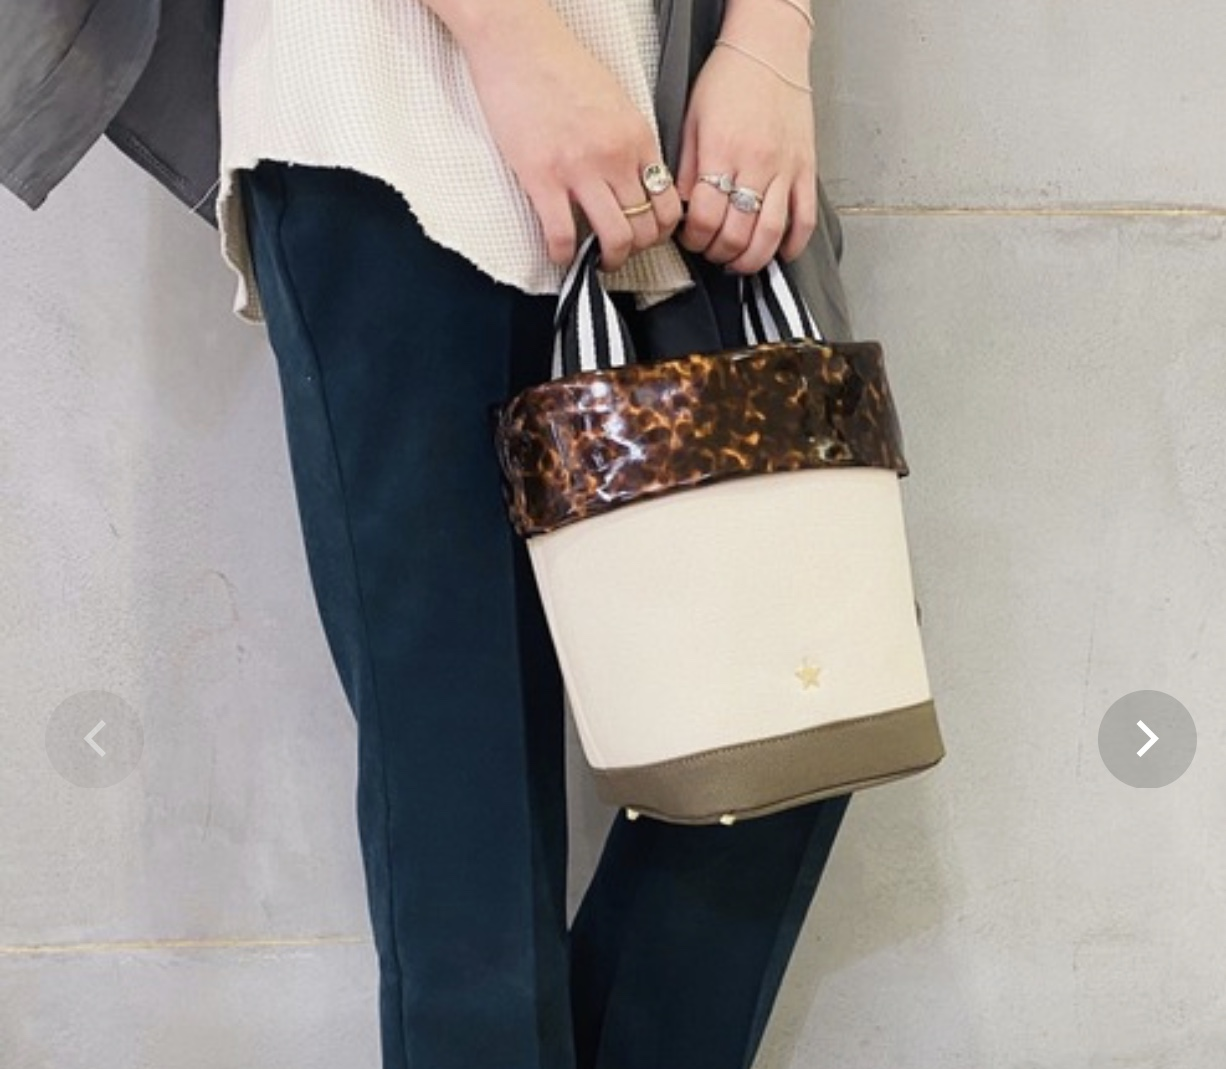 Scrap Book スクラップブック atneK アトネック キャンバス べっ高 ストライプ トートバッグ ハンドバッグ キャンバスバッグ canvas 星 帆布 底鋲付き 日本ブランド